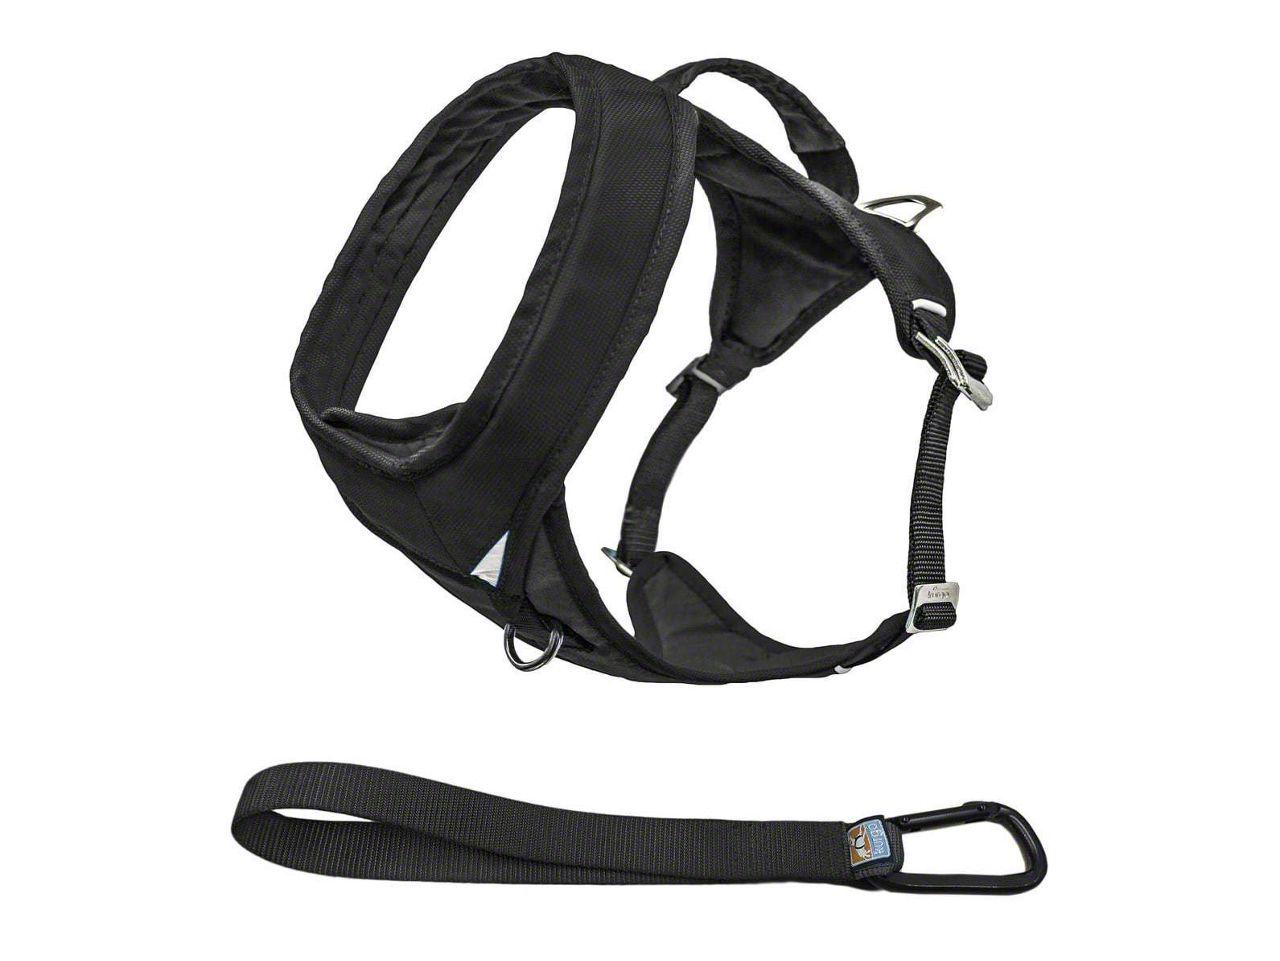 Kurgo Go-Tech Adventure Dog Harness - Black